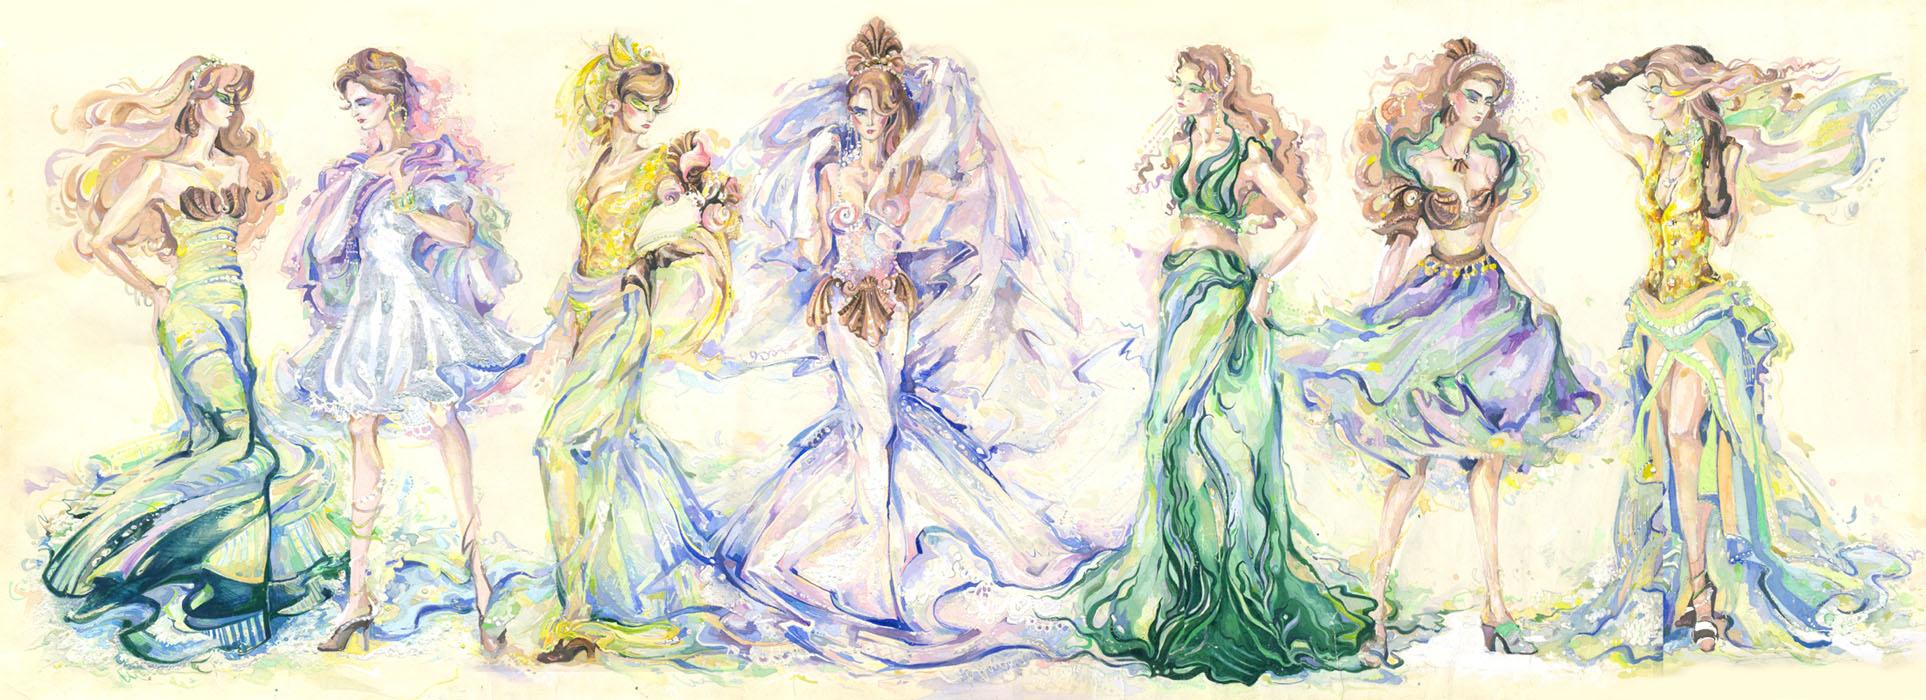 Marine Fashion Collection by Callista1981